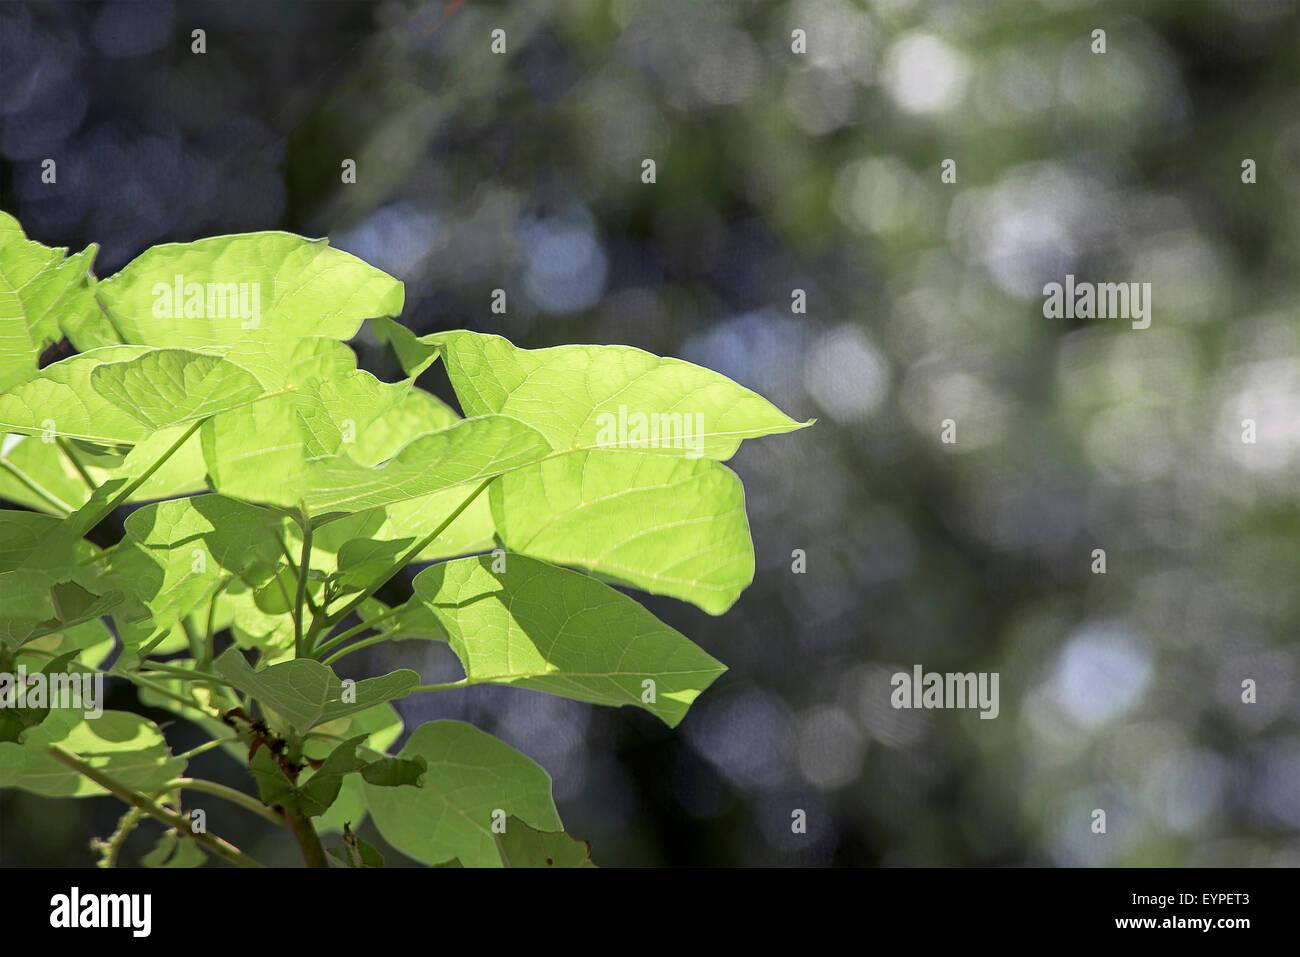 Sun shining through the leaves - Stock Image